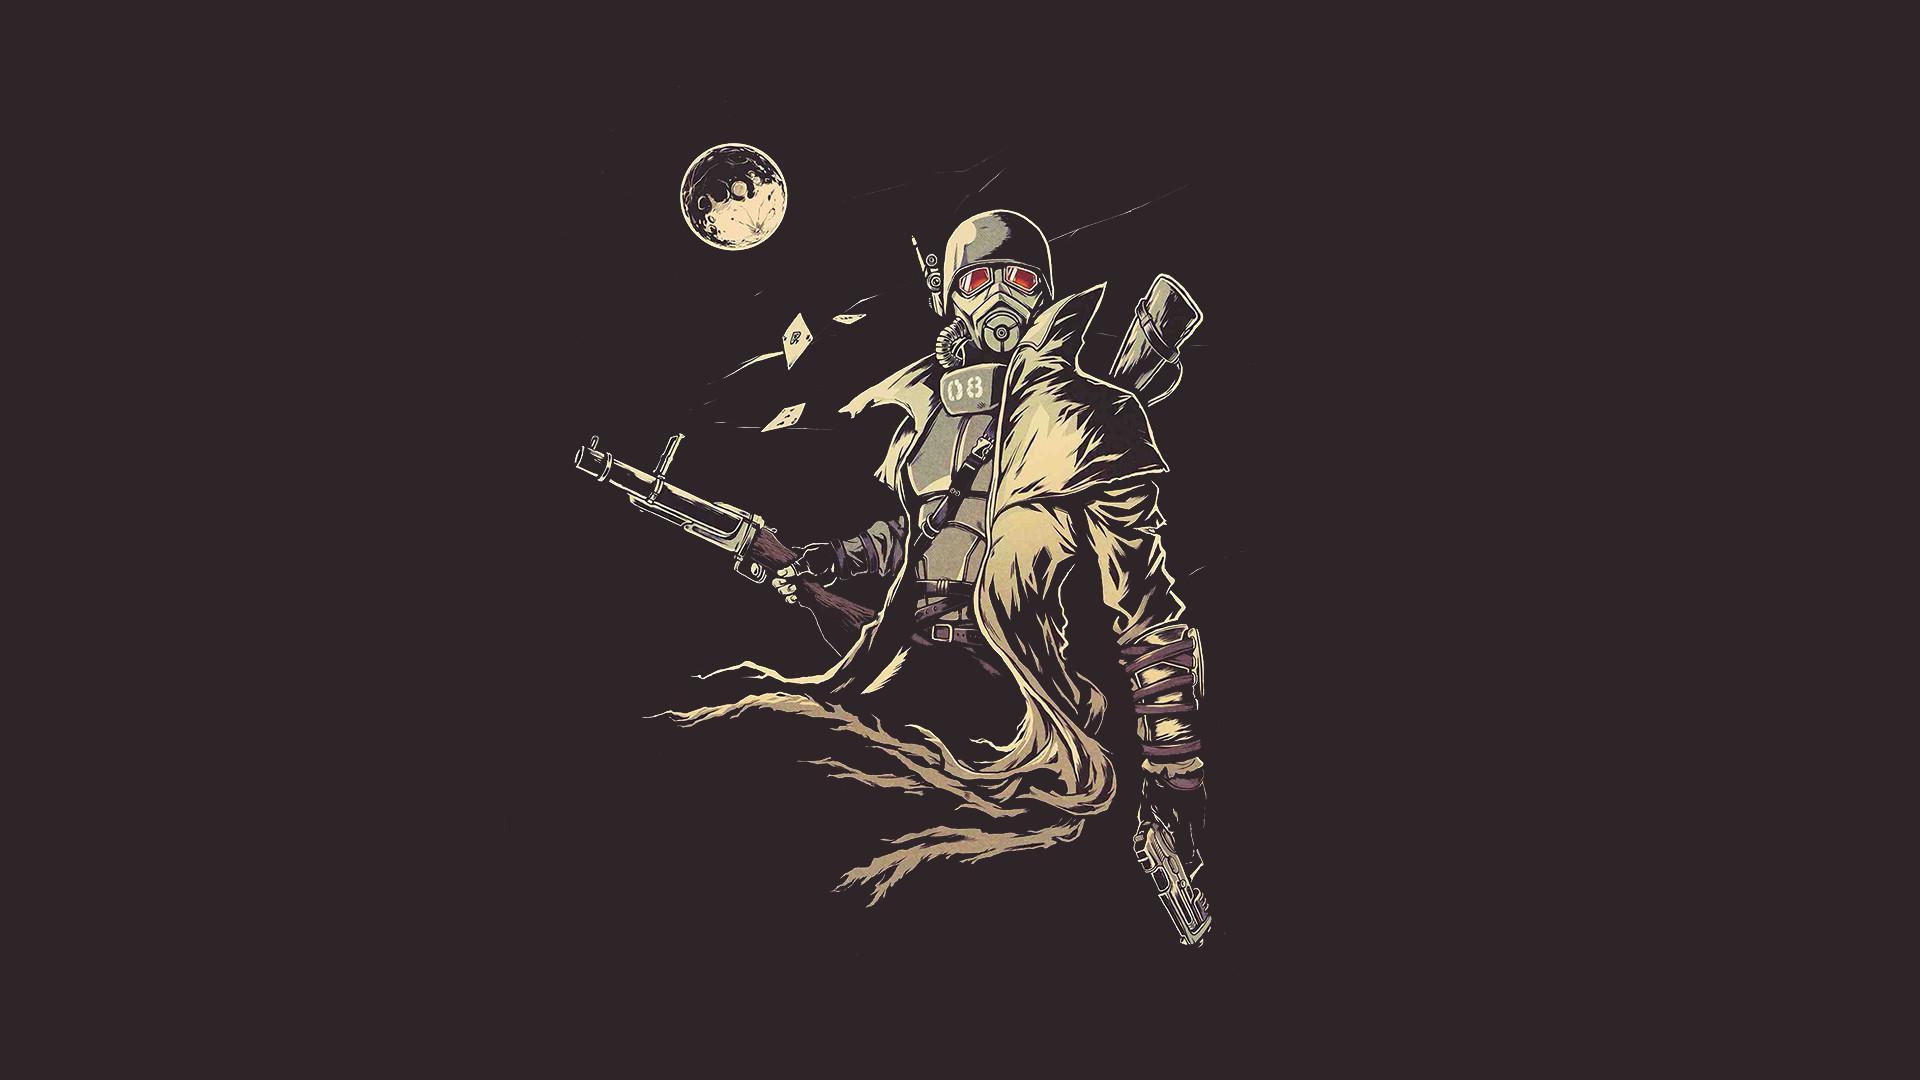 Fallout Ncr Wallpaper ·①